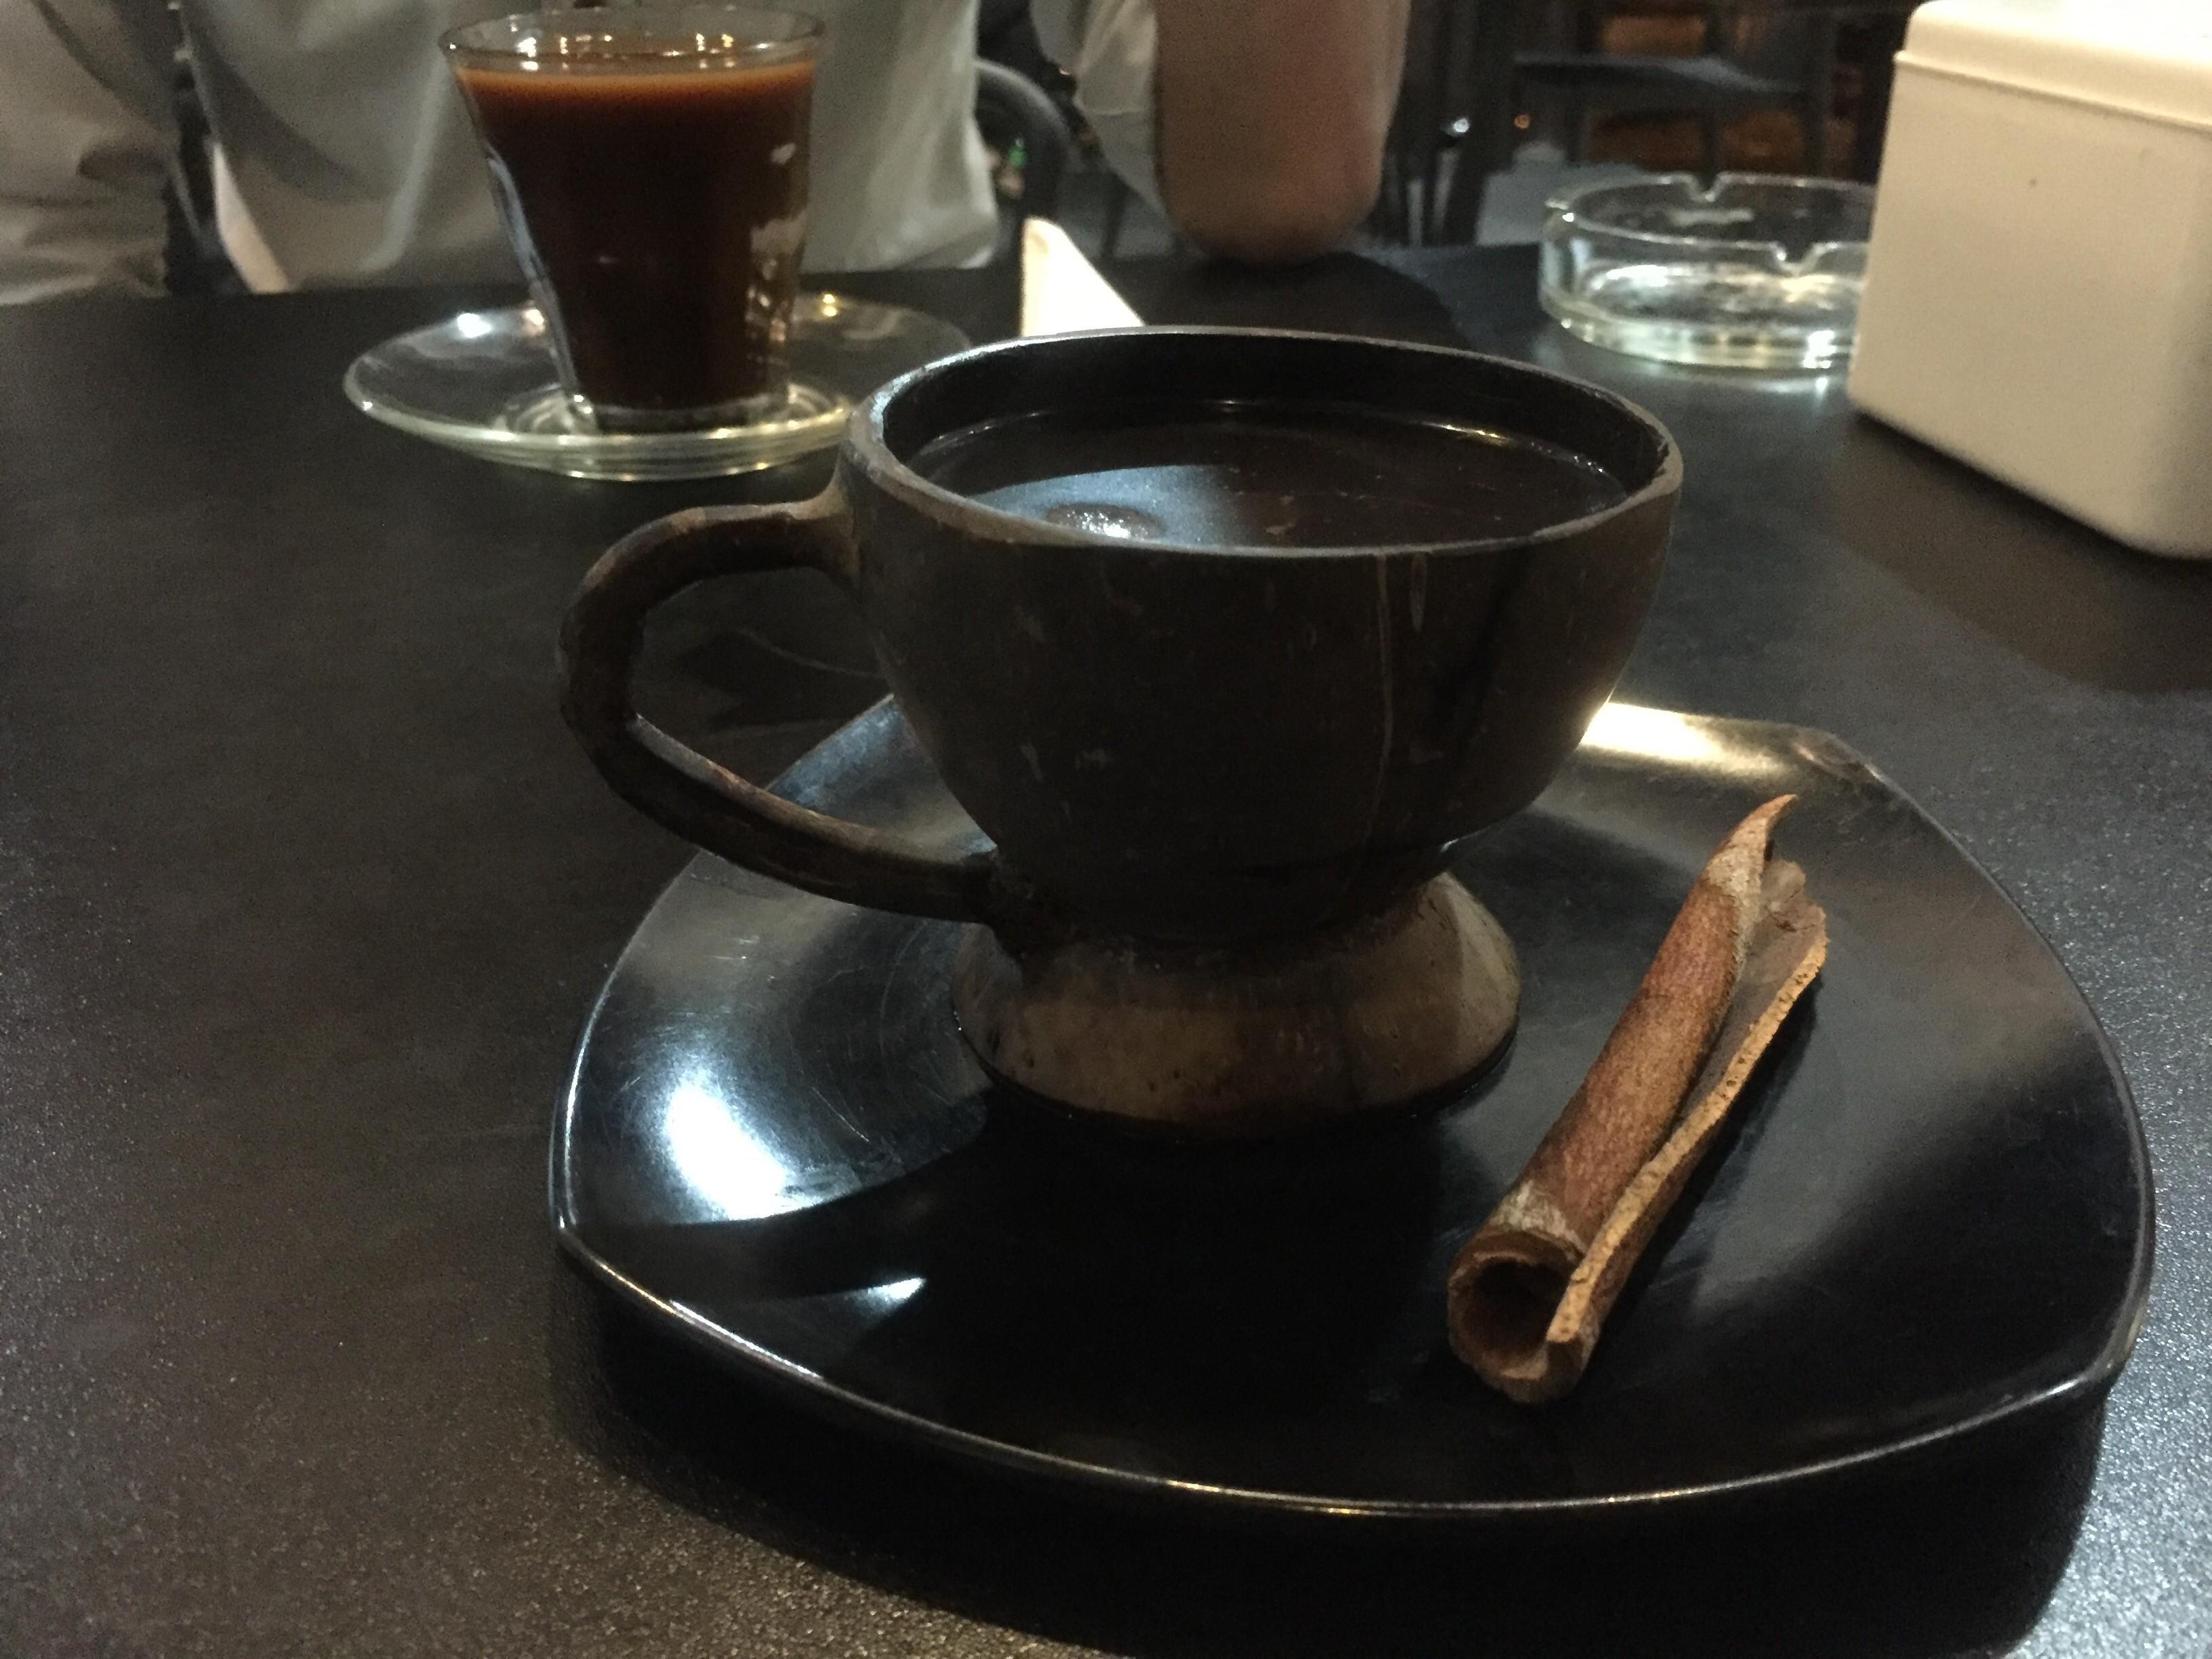 takar coffee is typical indonesian coffee